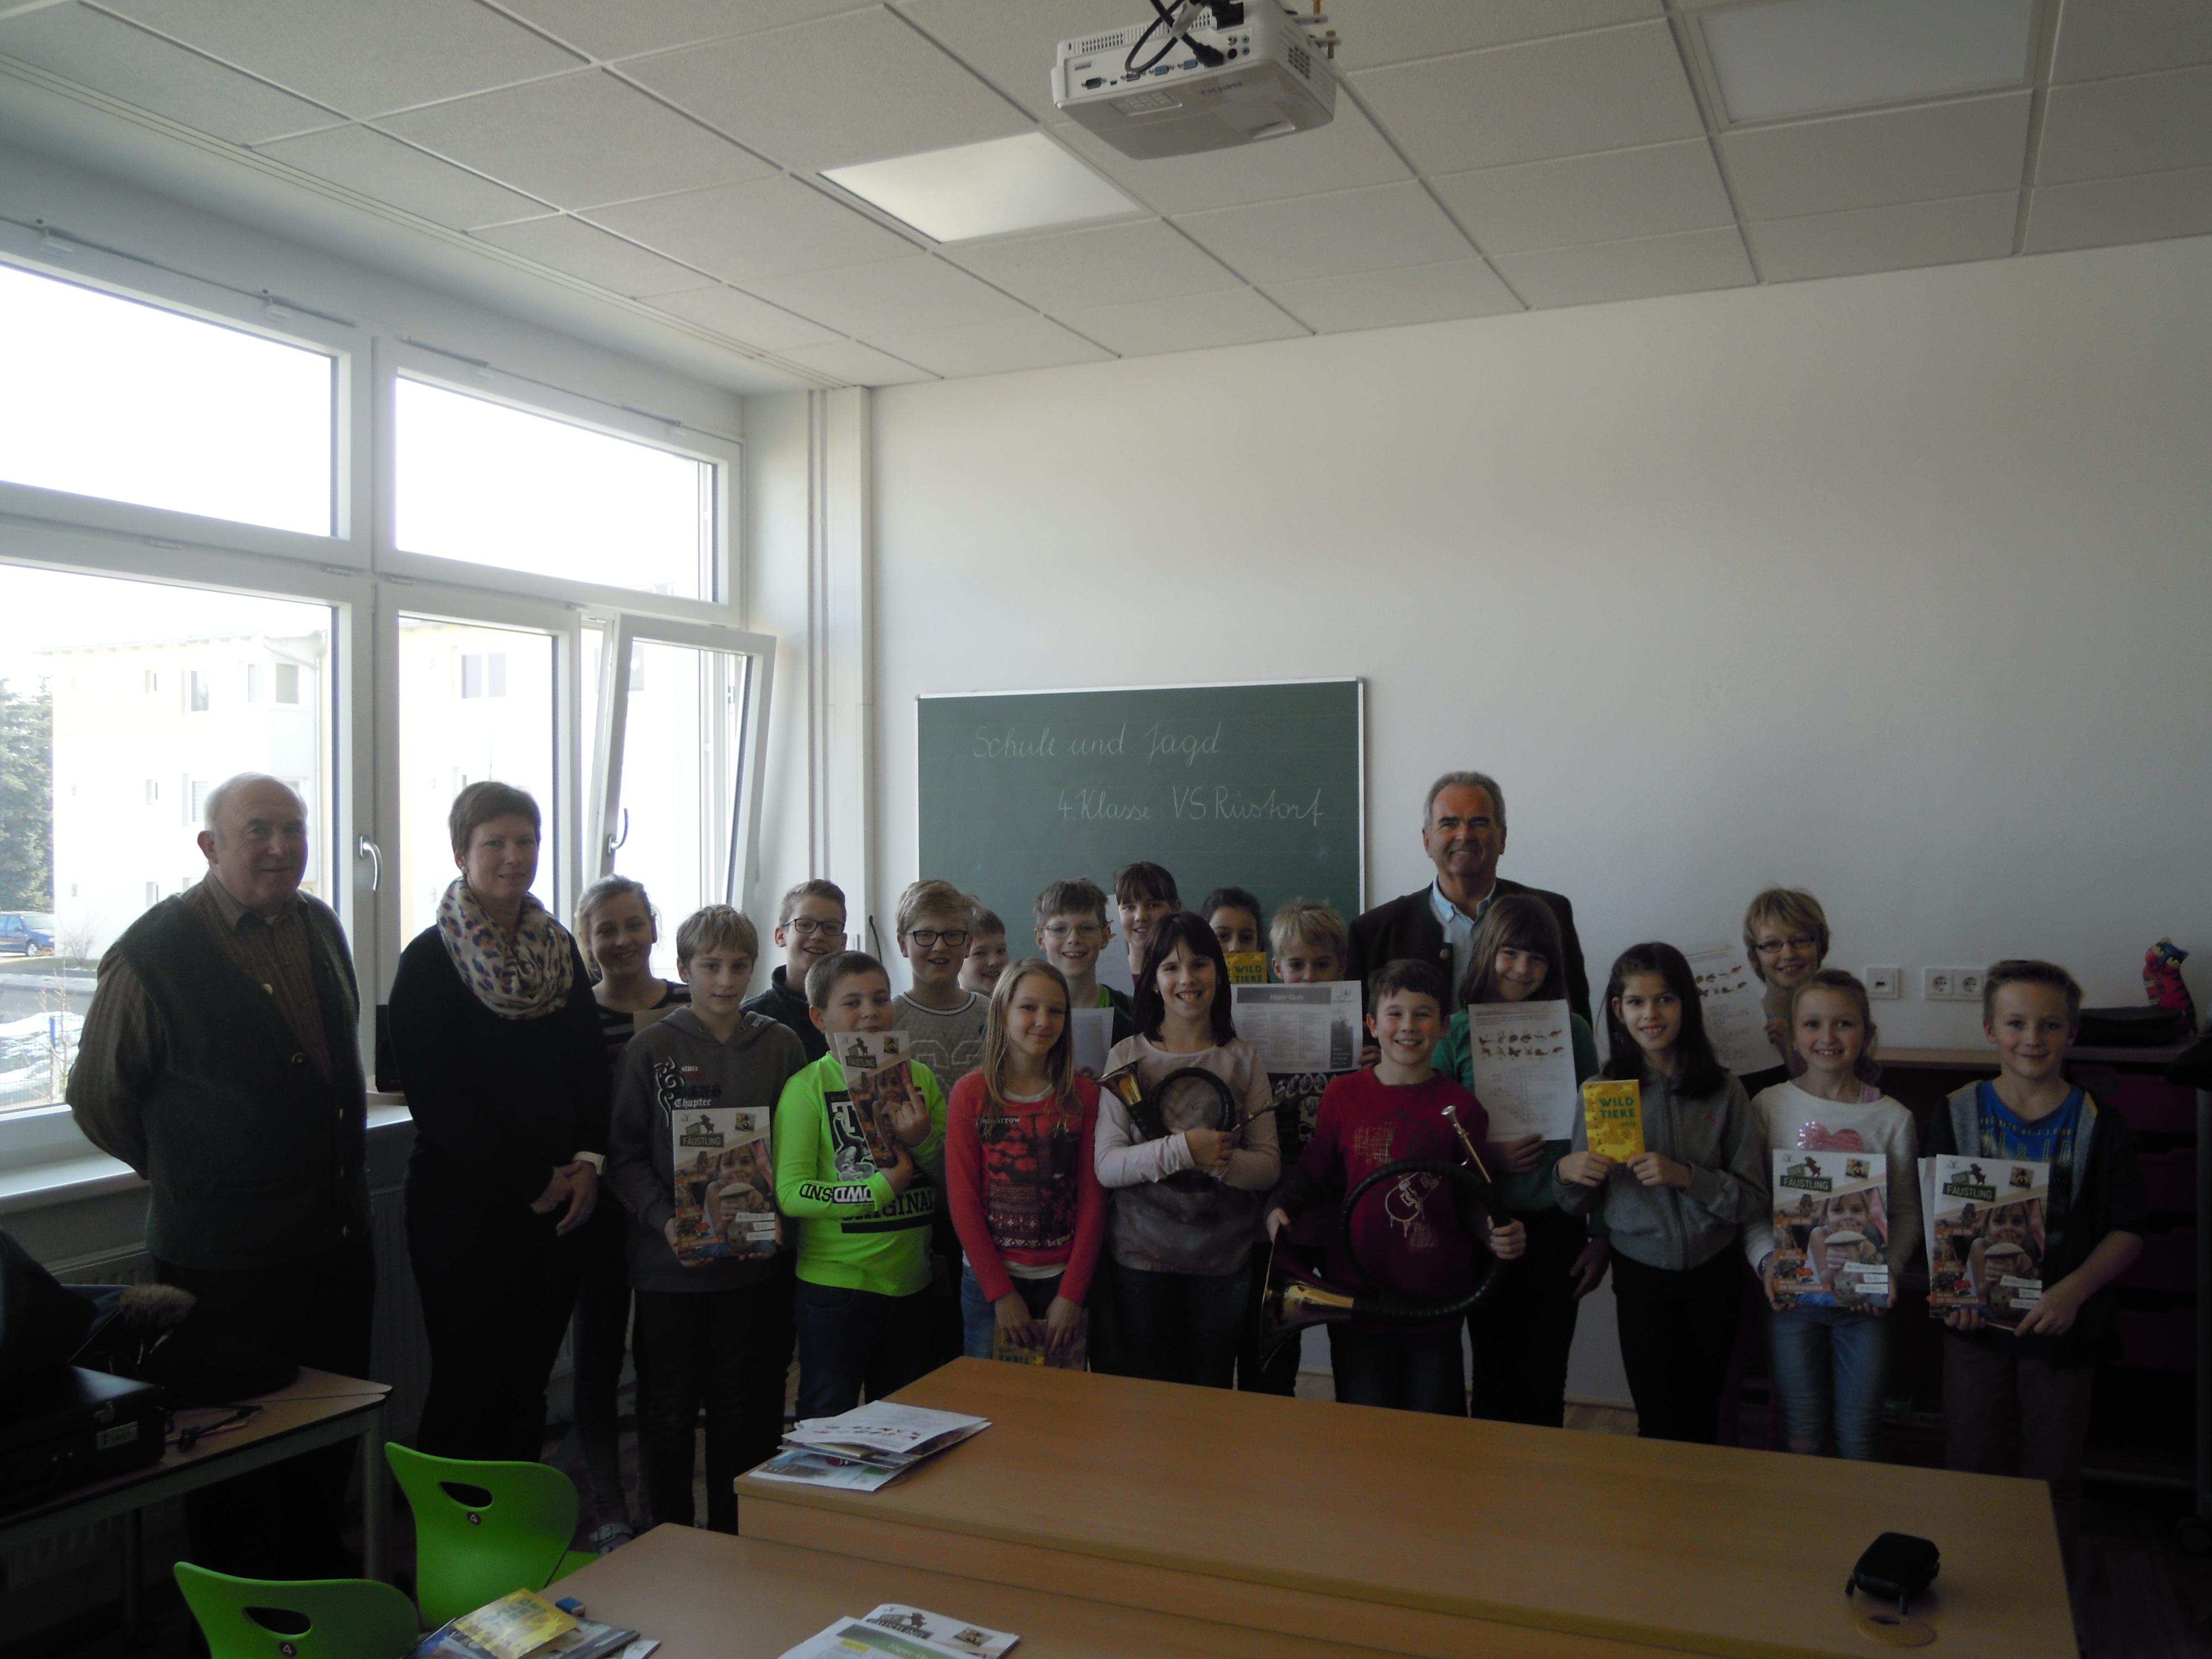 Tolles Projekt Schule und Jagd in VS Rüstorf – OÖ LJV